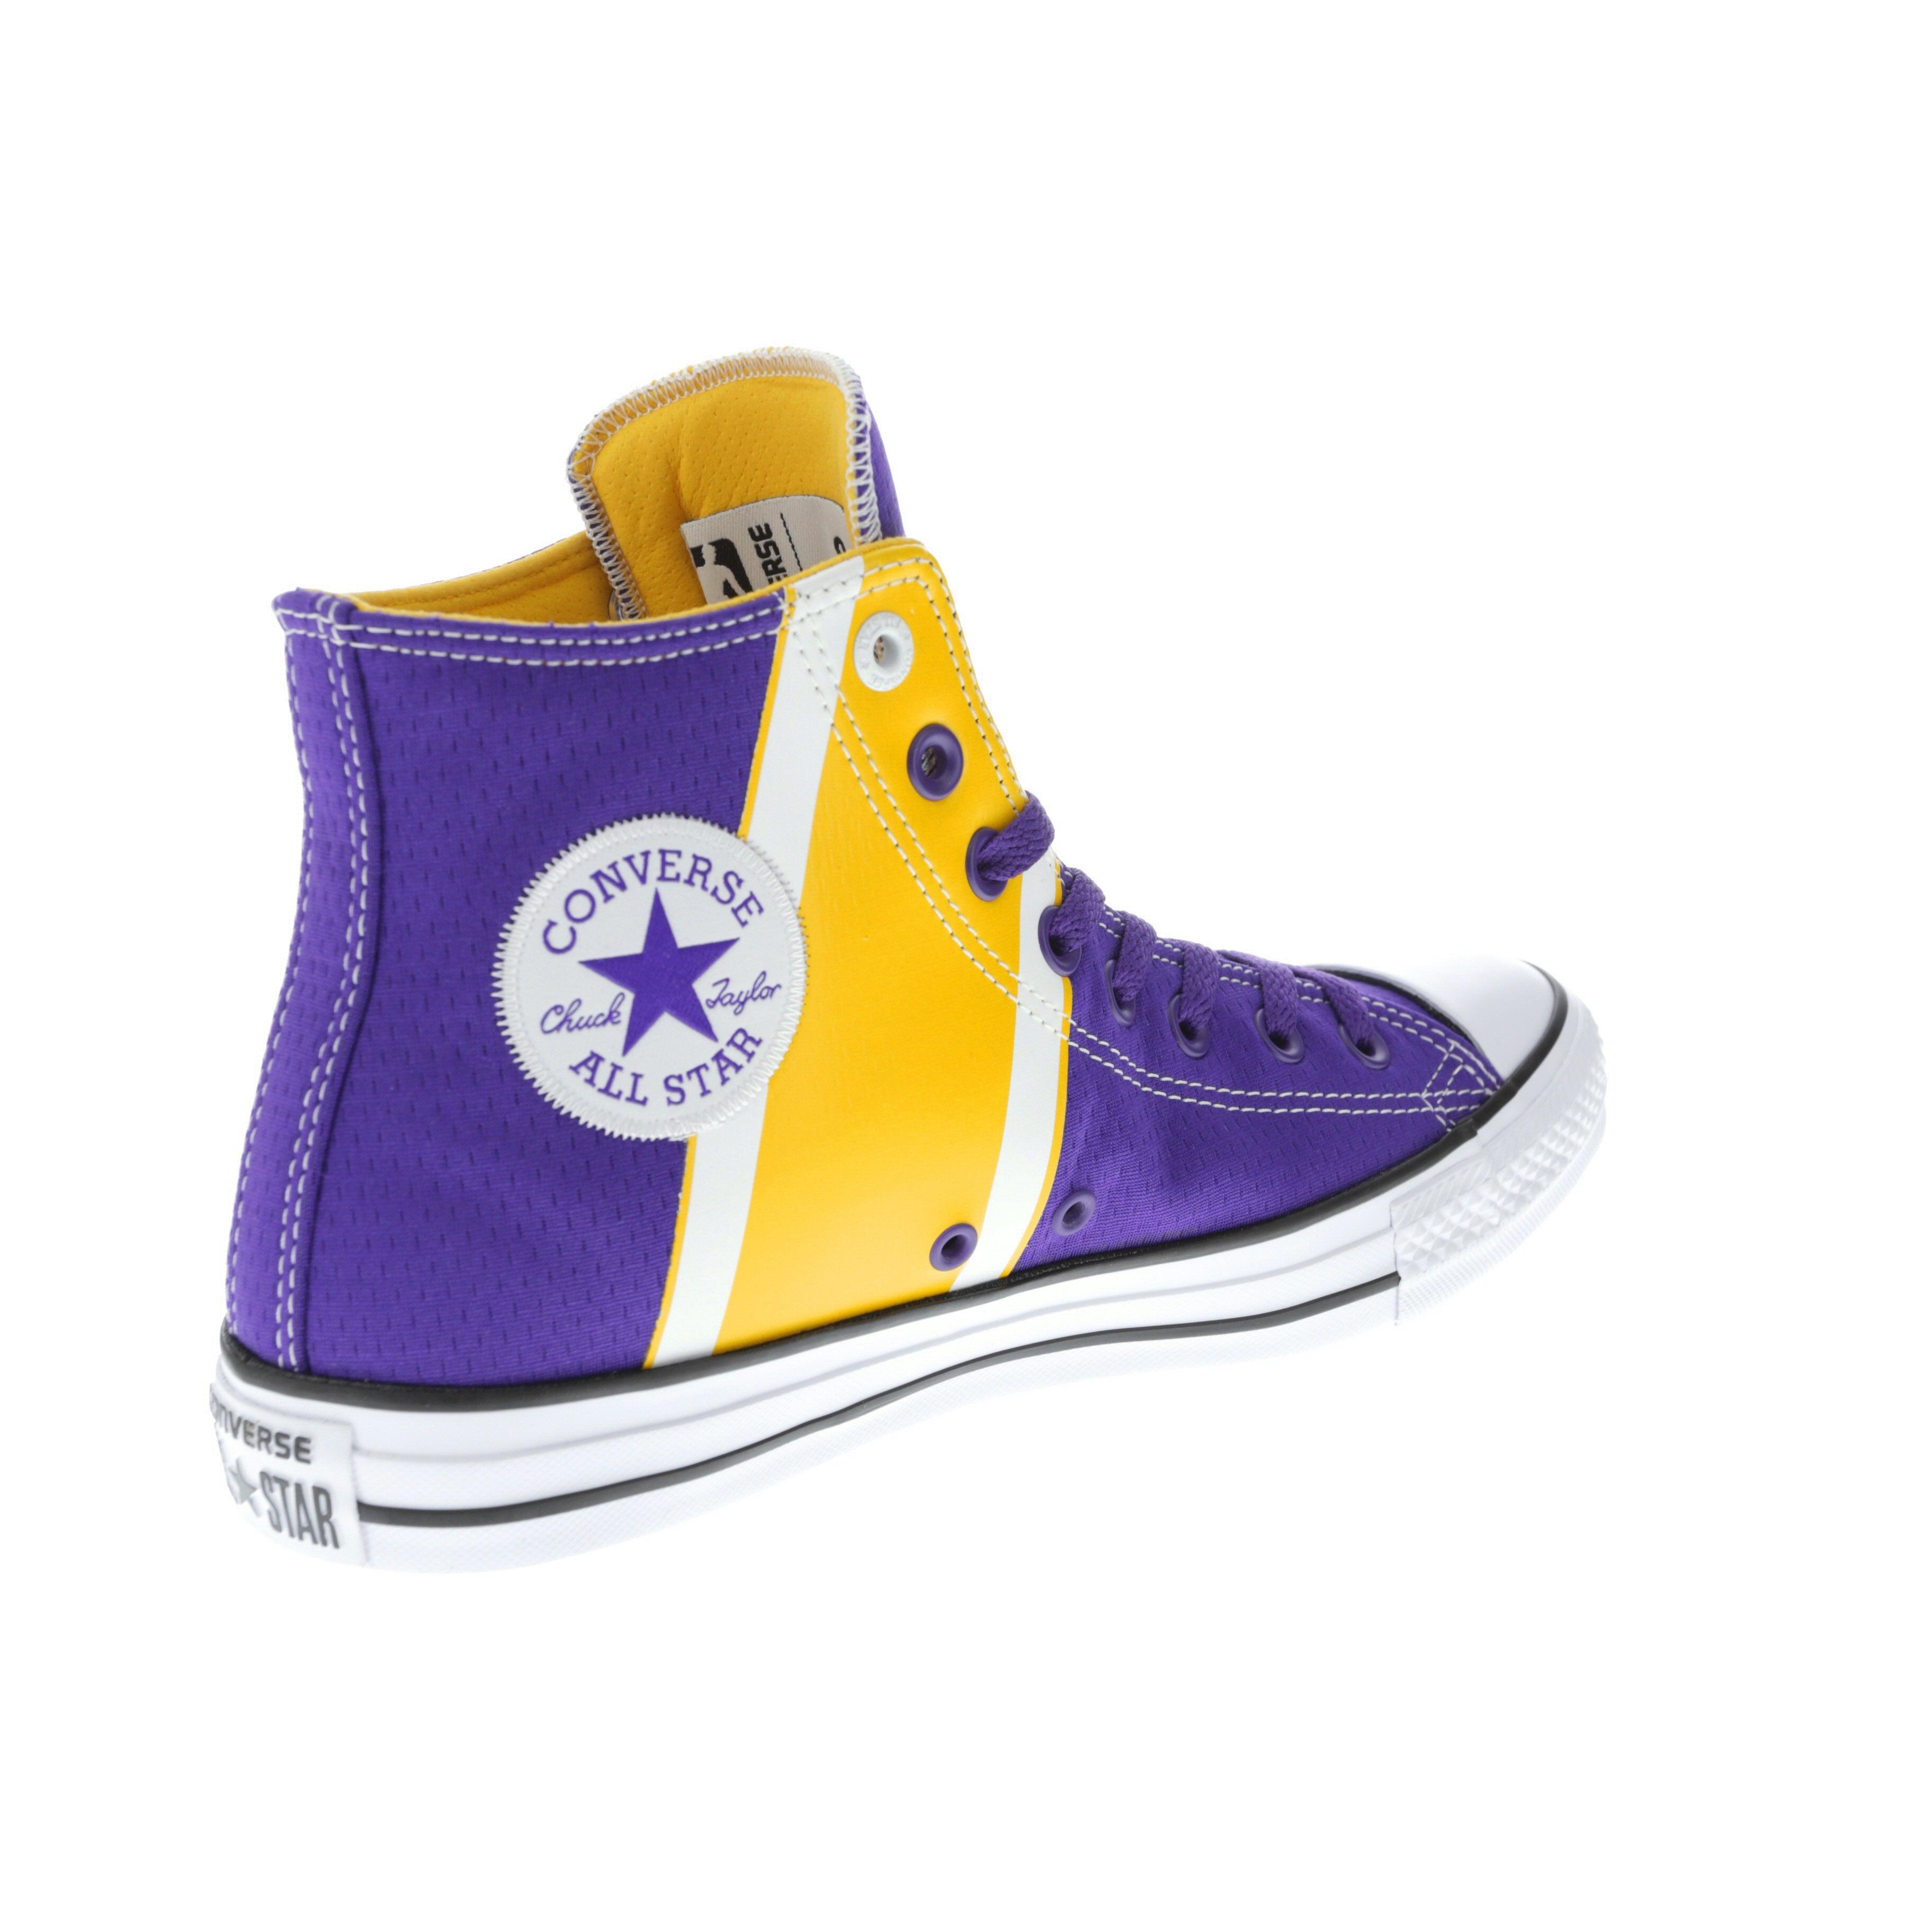 Converse X NBA Chuck Taylor All Star Hi Los Angeles Lakers Purple